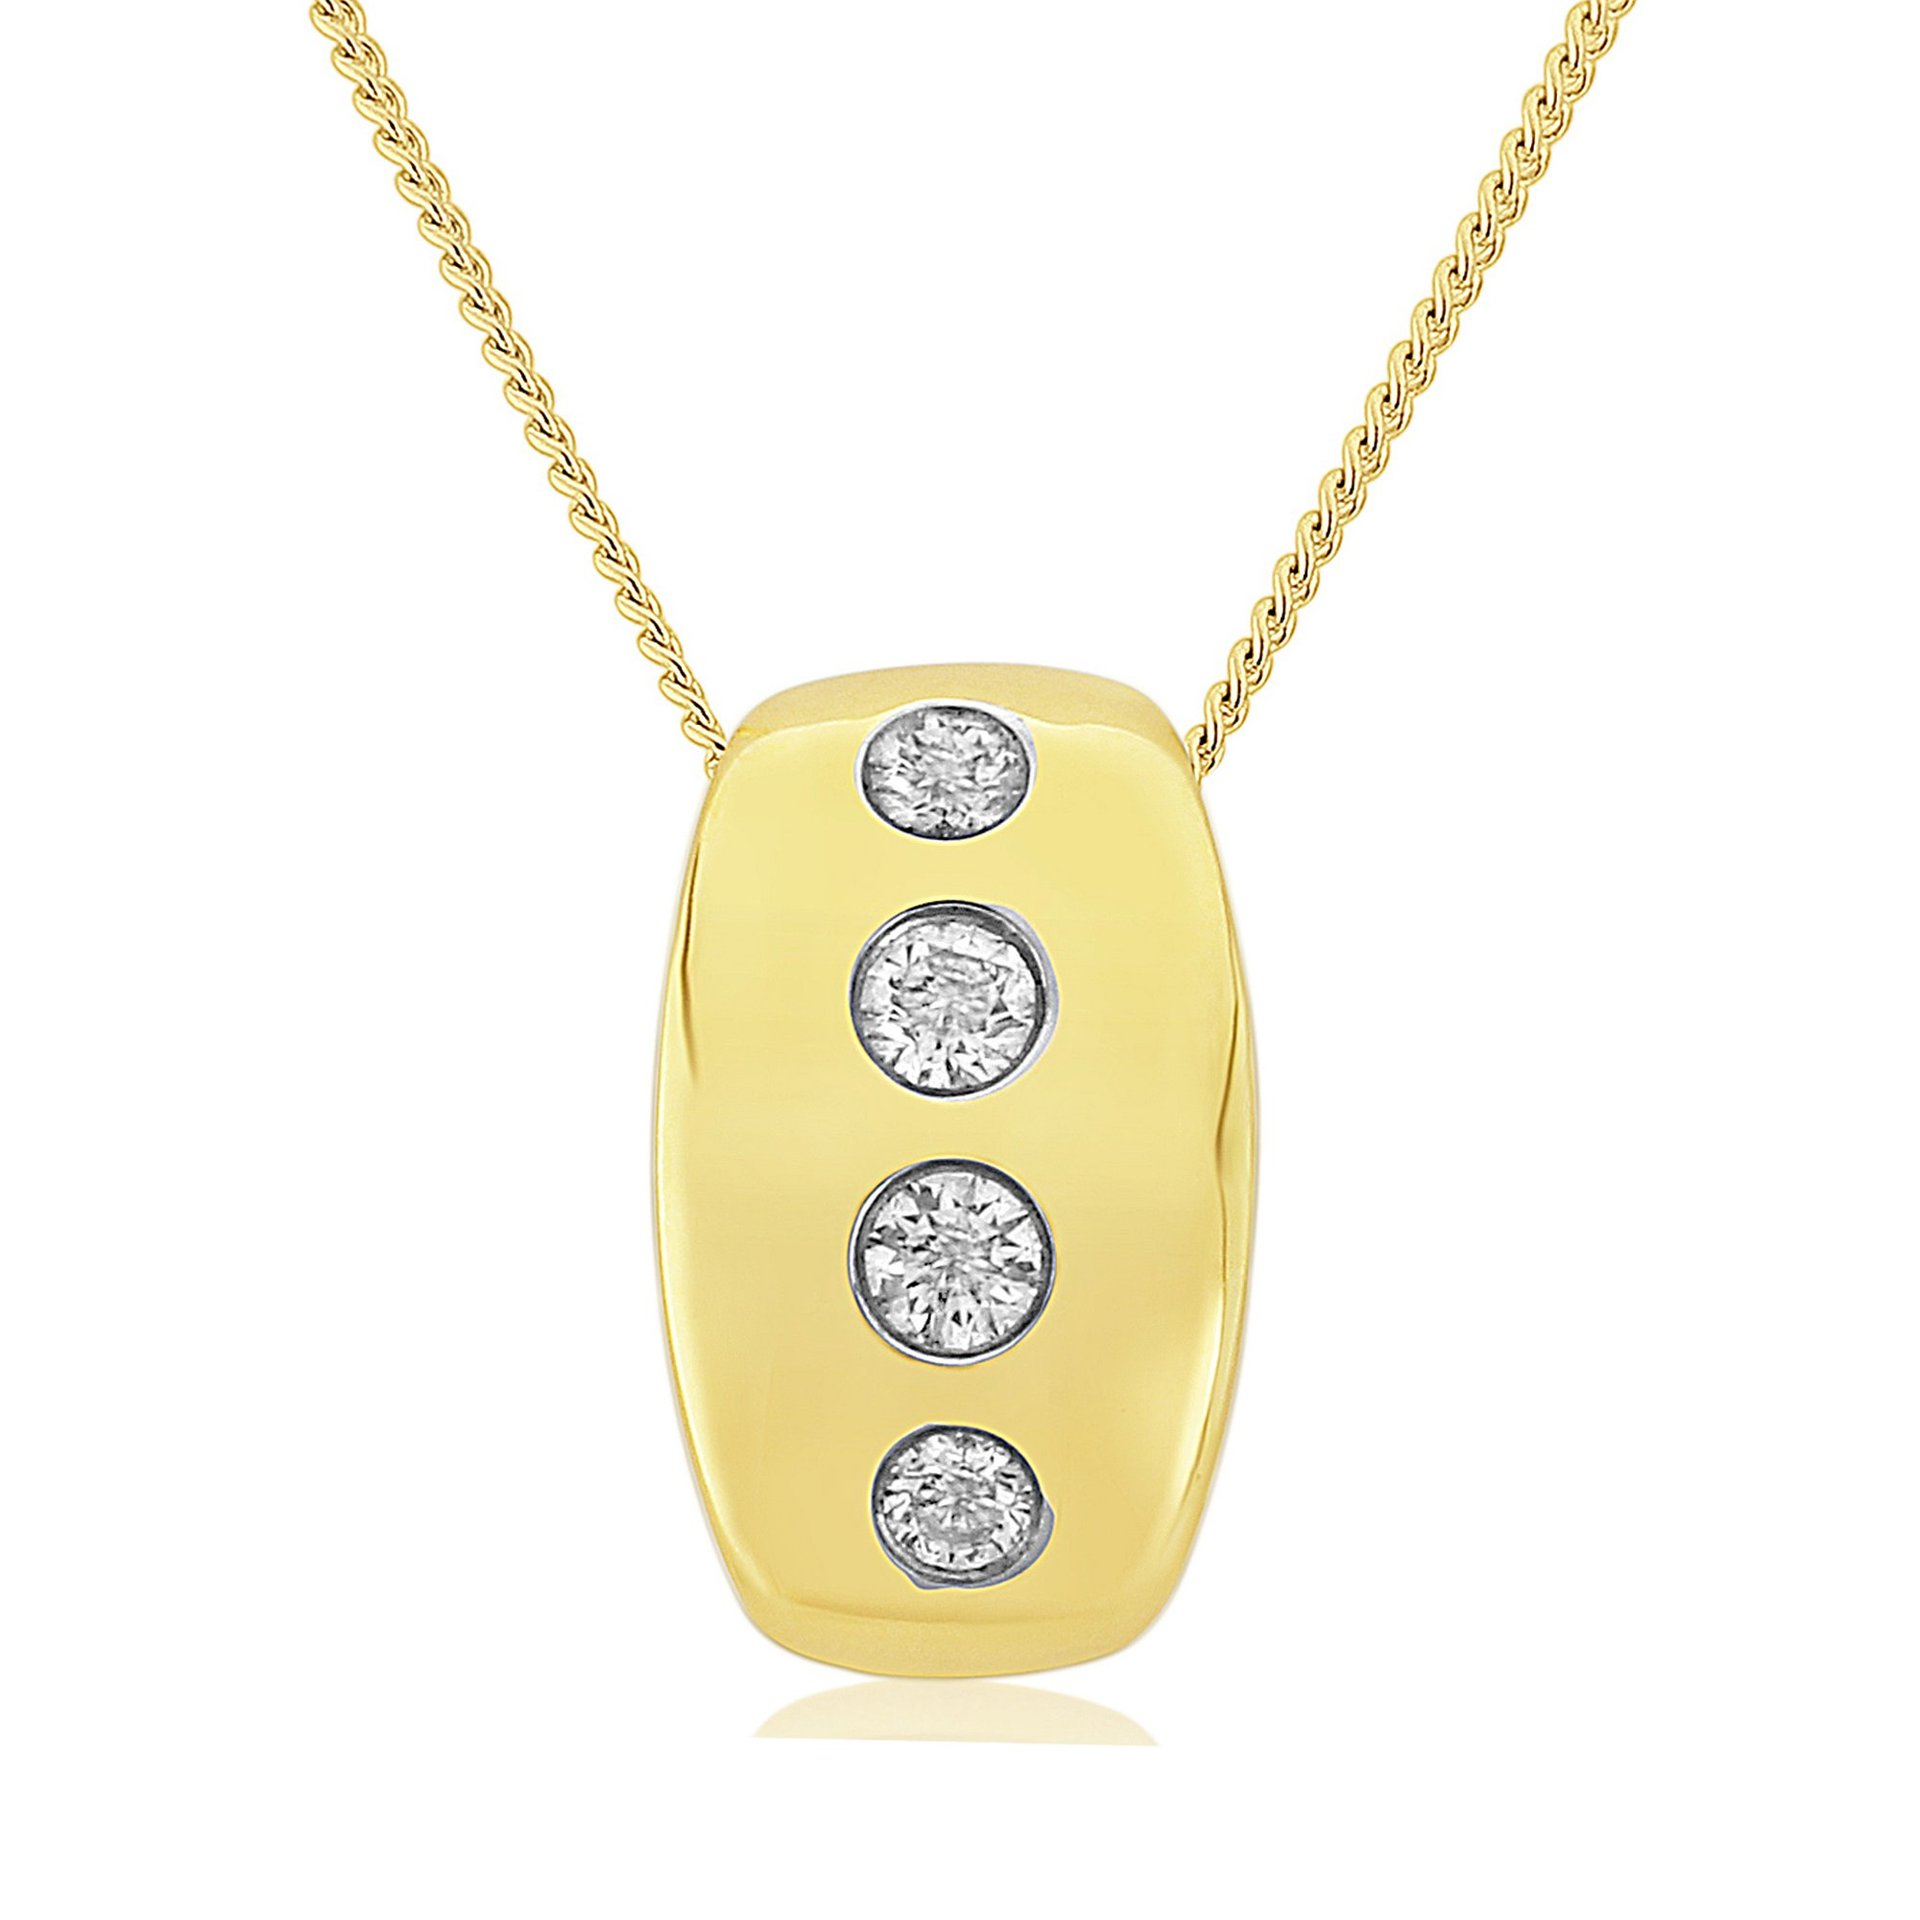 Rudells Embrace 18ct Yellow Gold Pendant